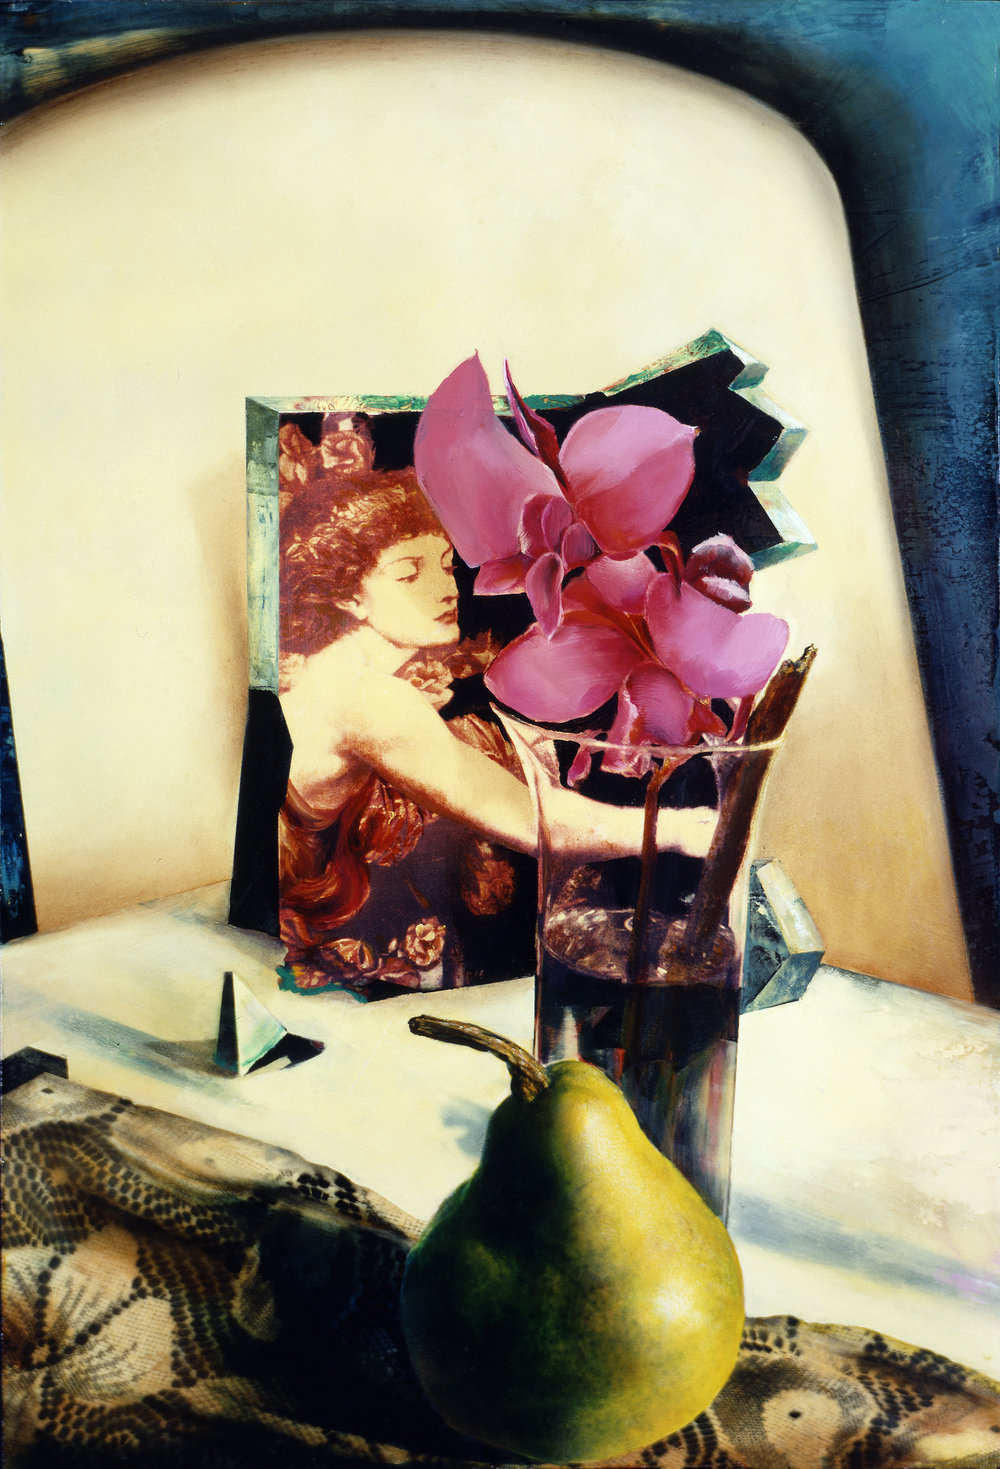 Golden Pear, Magenta Orchid